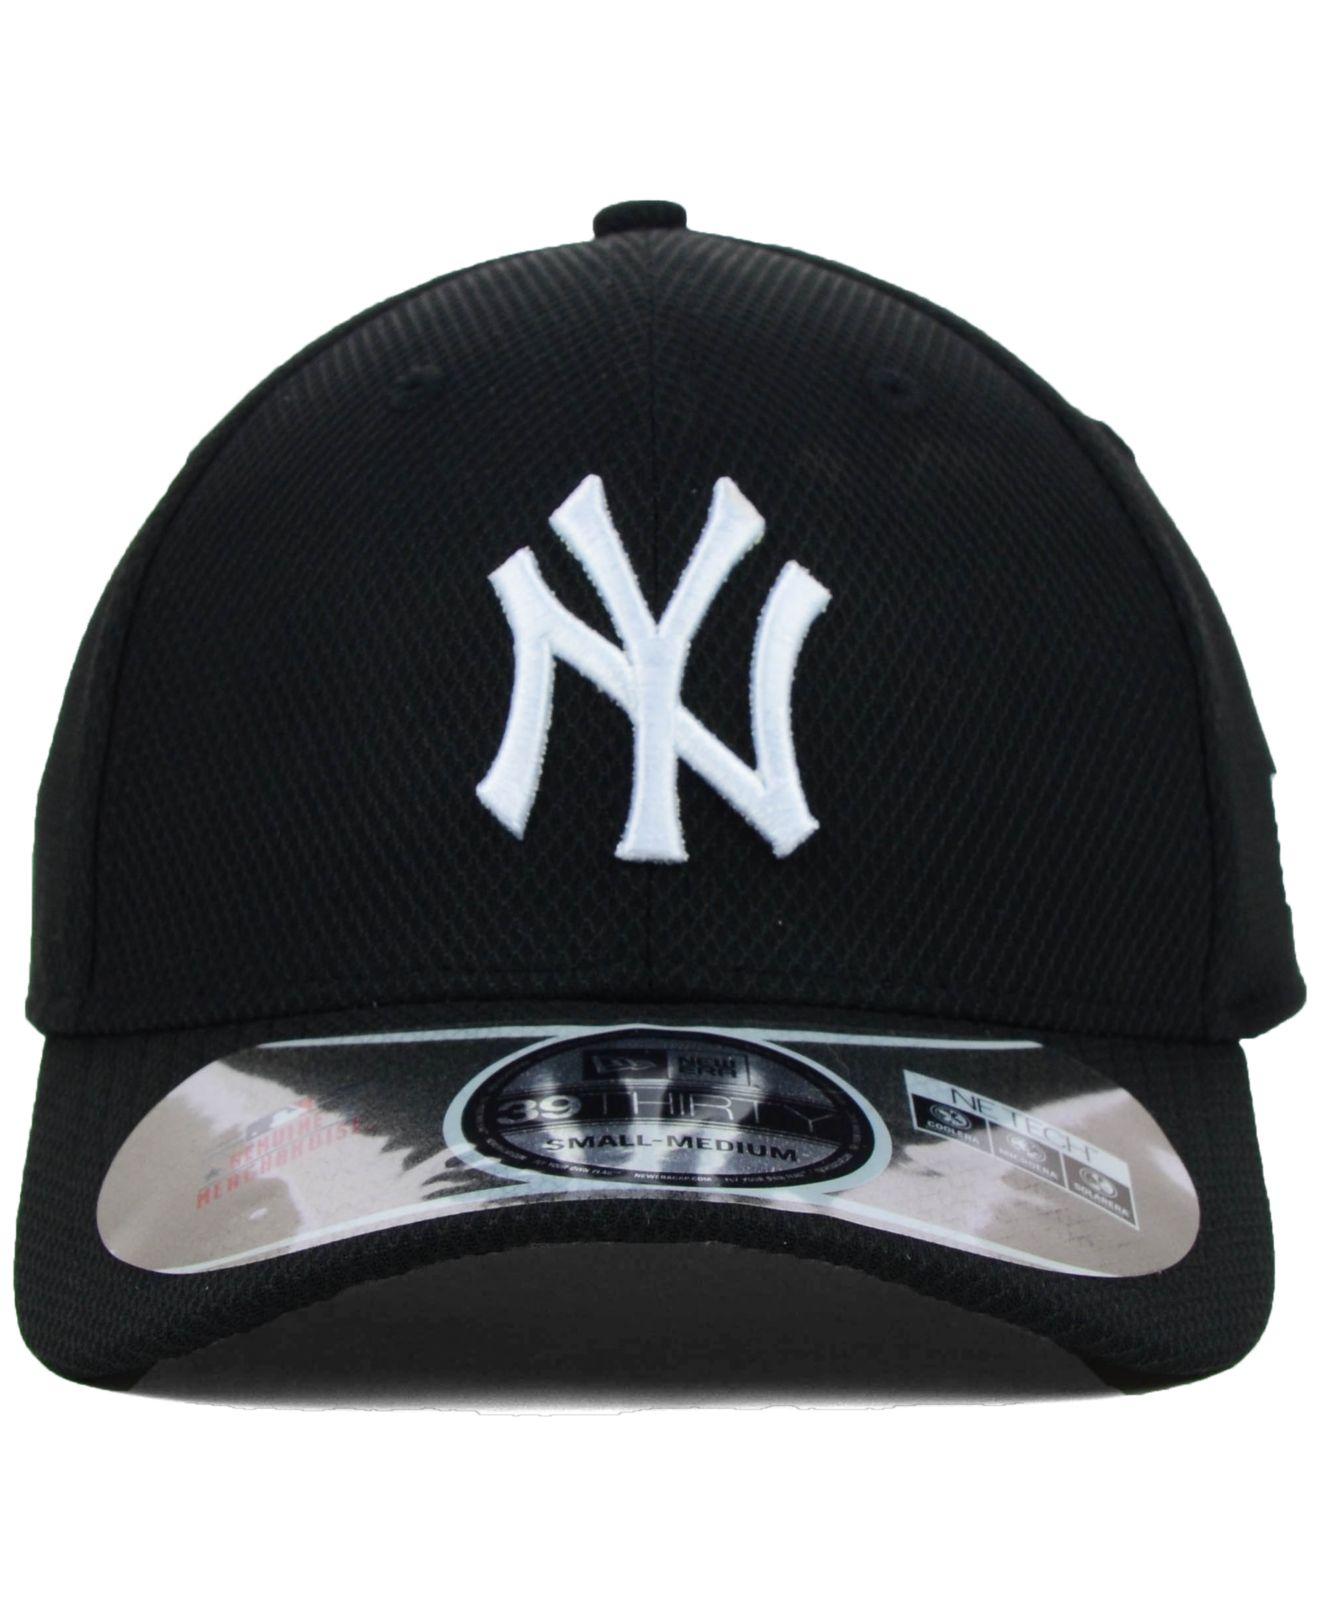 403c18f01adf6e KTZ New York Yankees Mlb Diamond Era Black 39thirty Cap in Black for ...